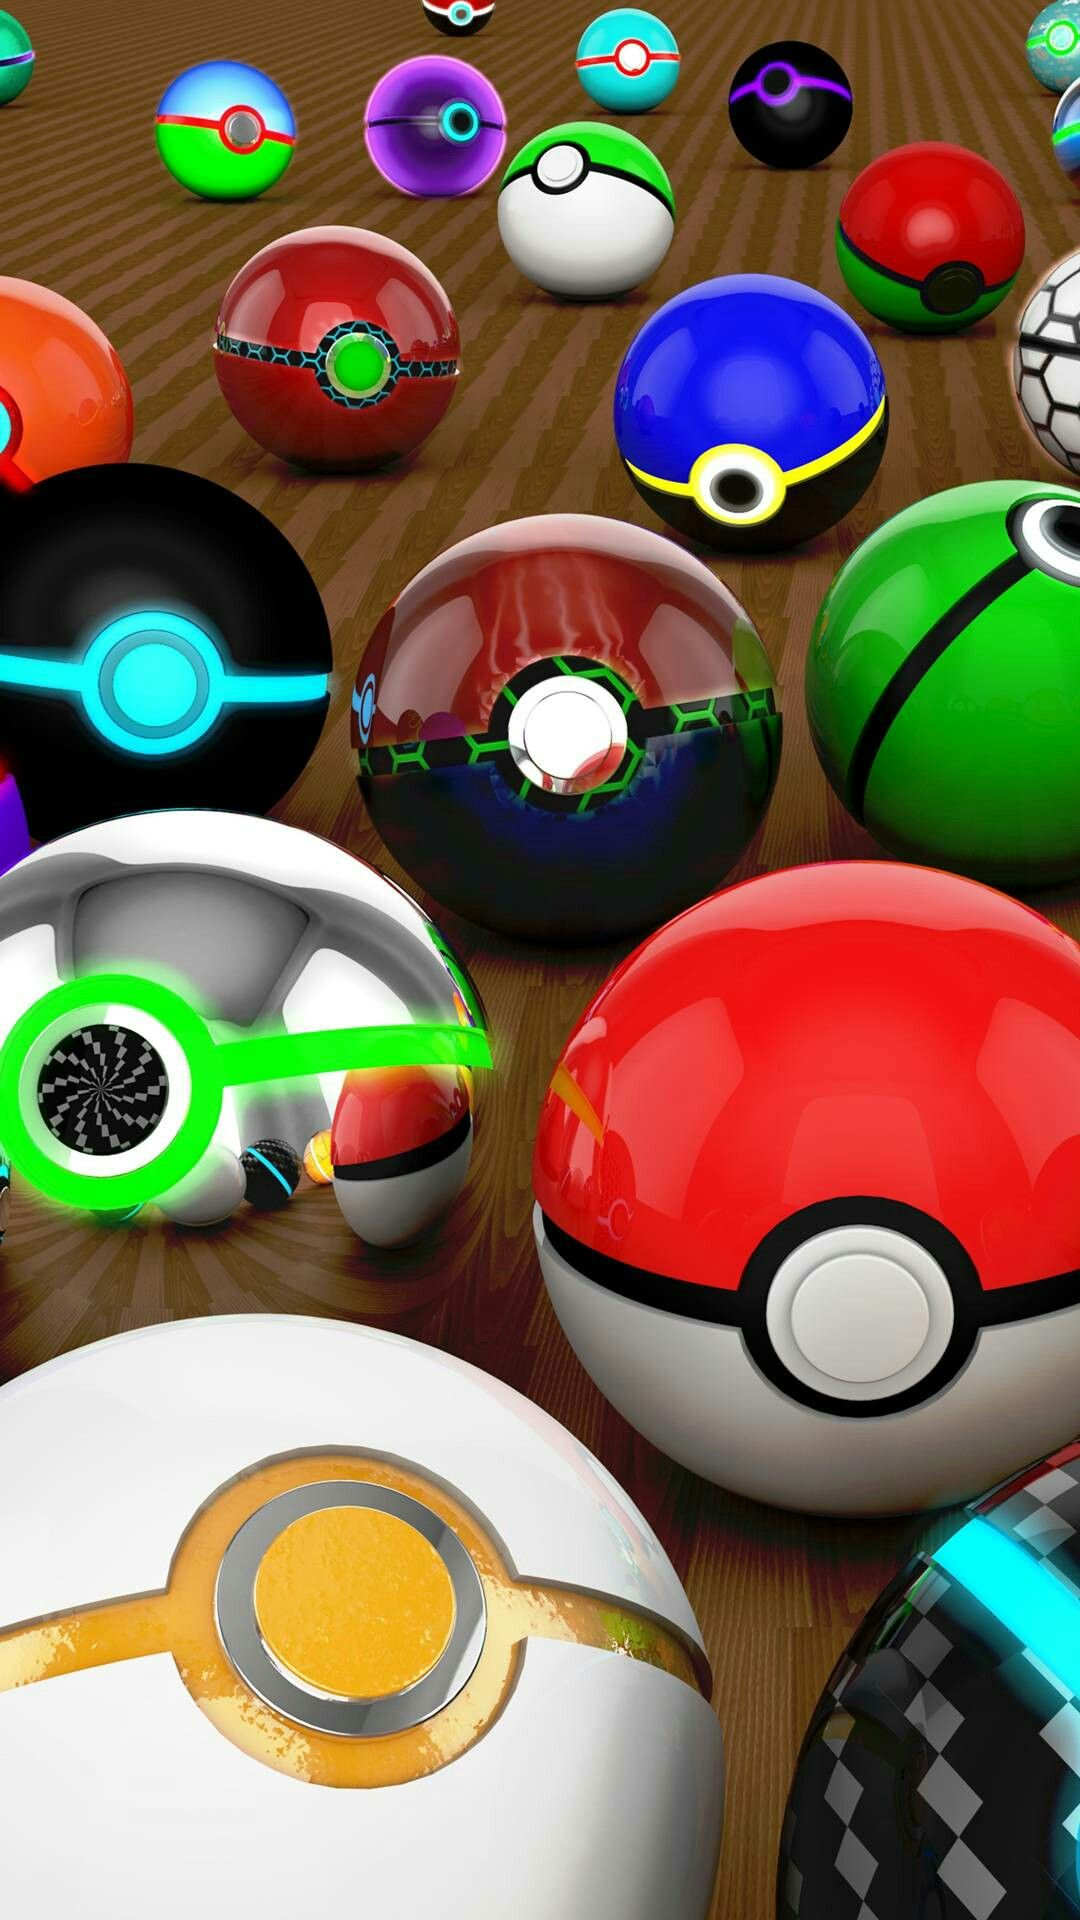 Different Pokeball Pokeball wallpaper, Android wallpaper